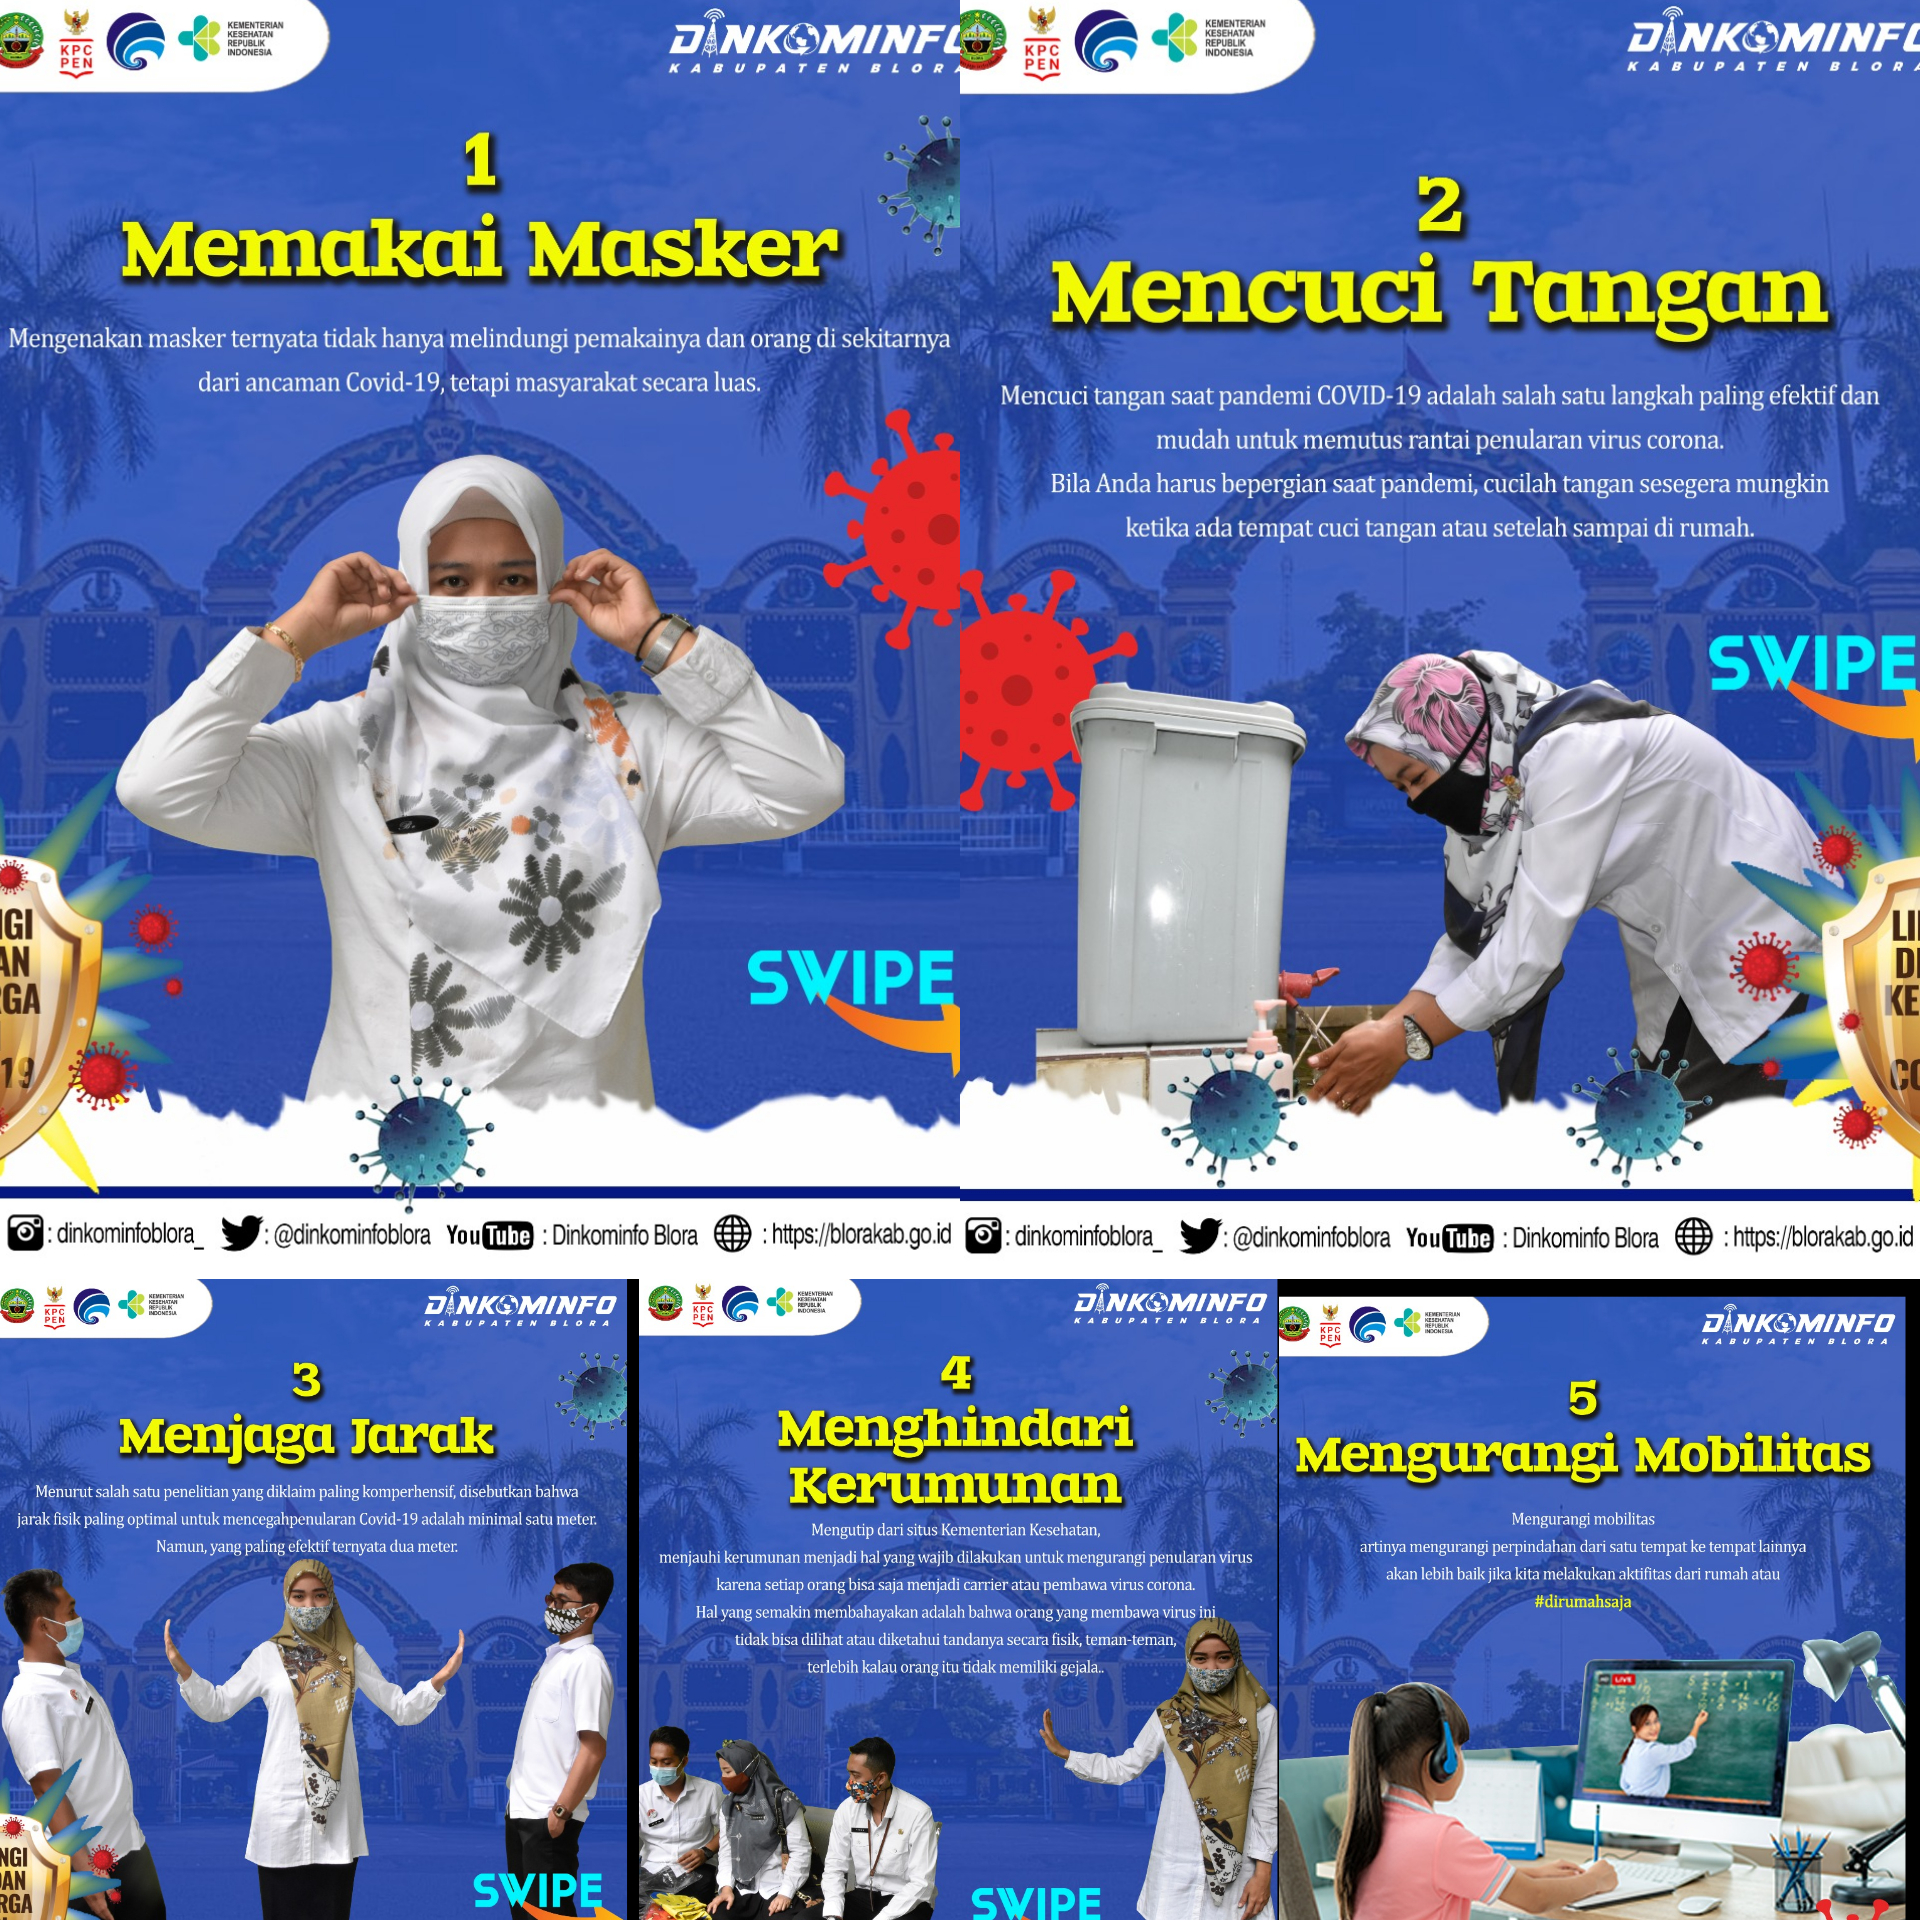 Menjaga 5M, pesan dari sahabat SMP Karang Arum